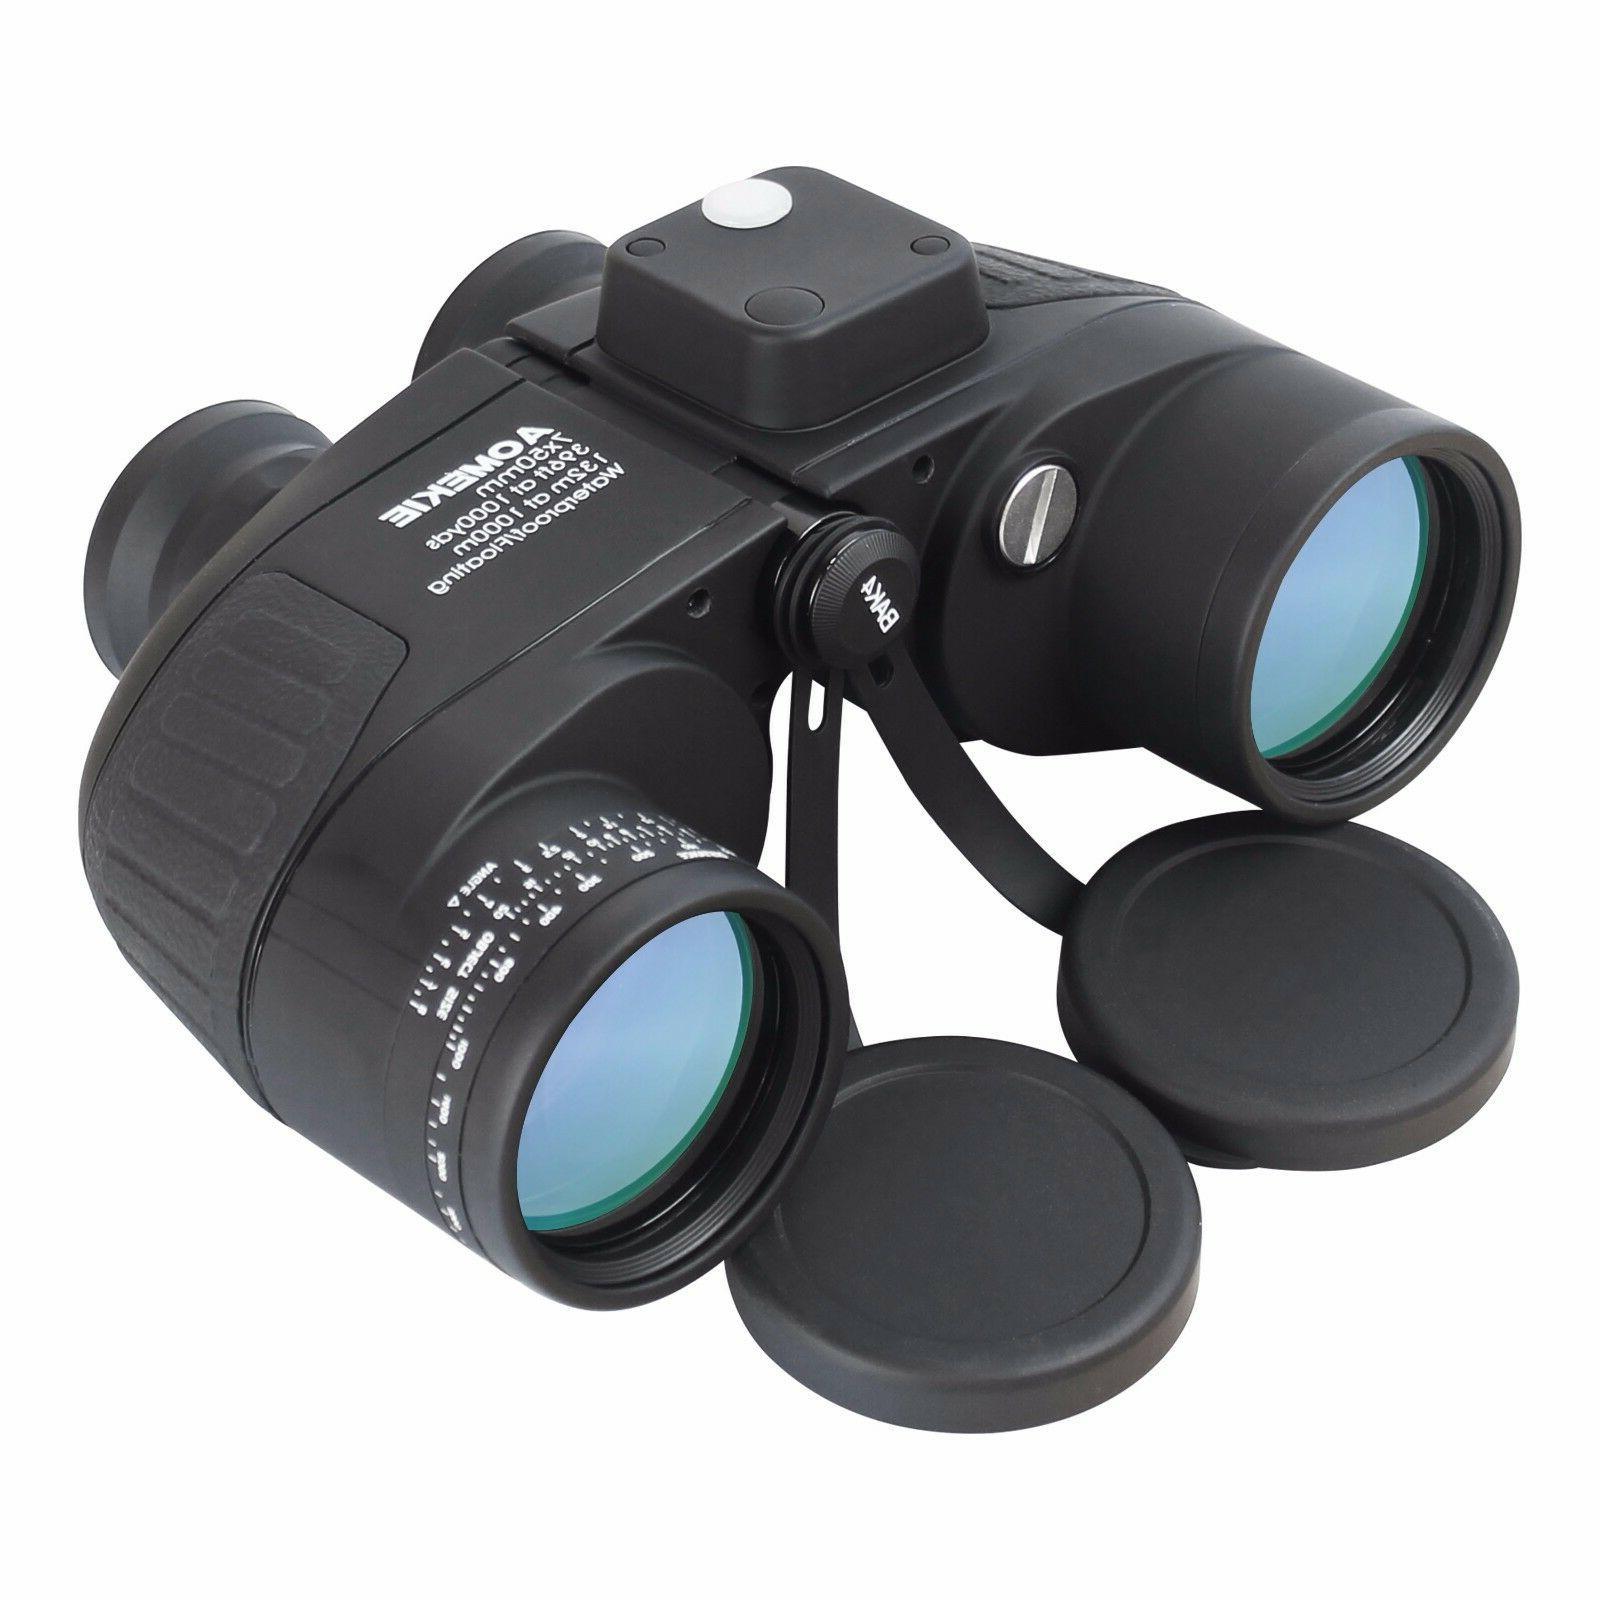 7X50 Binoculars with Rangefinder Compass Waterproof Hunting